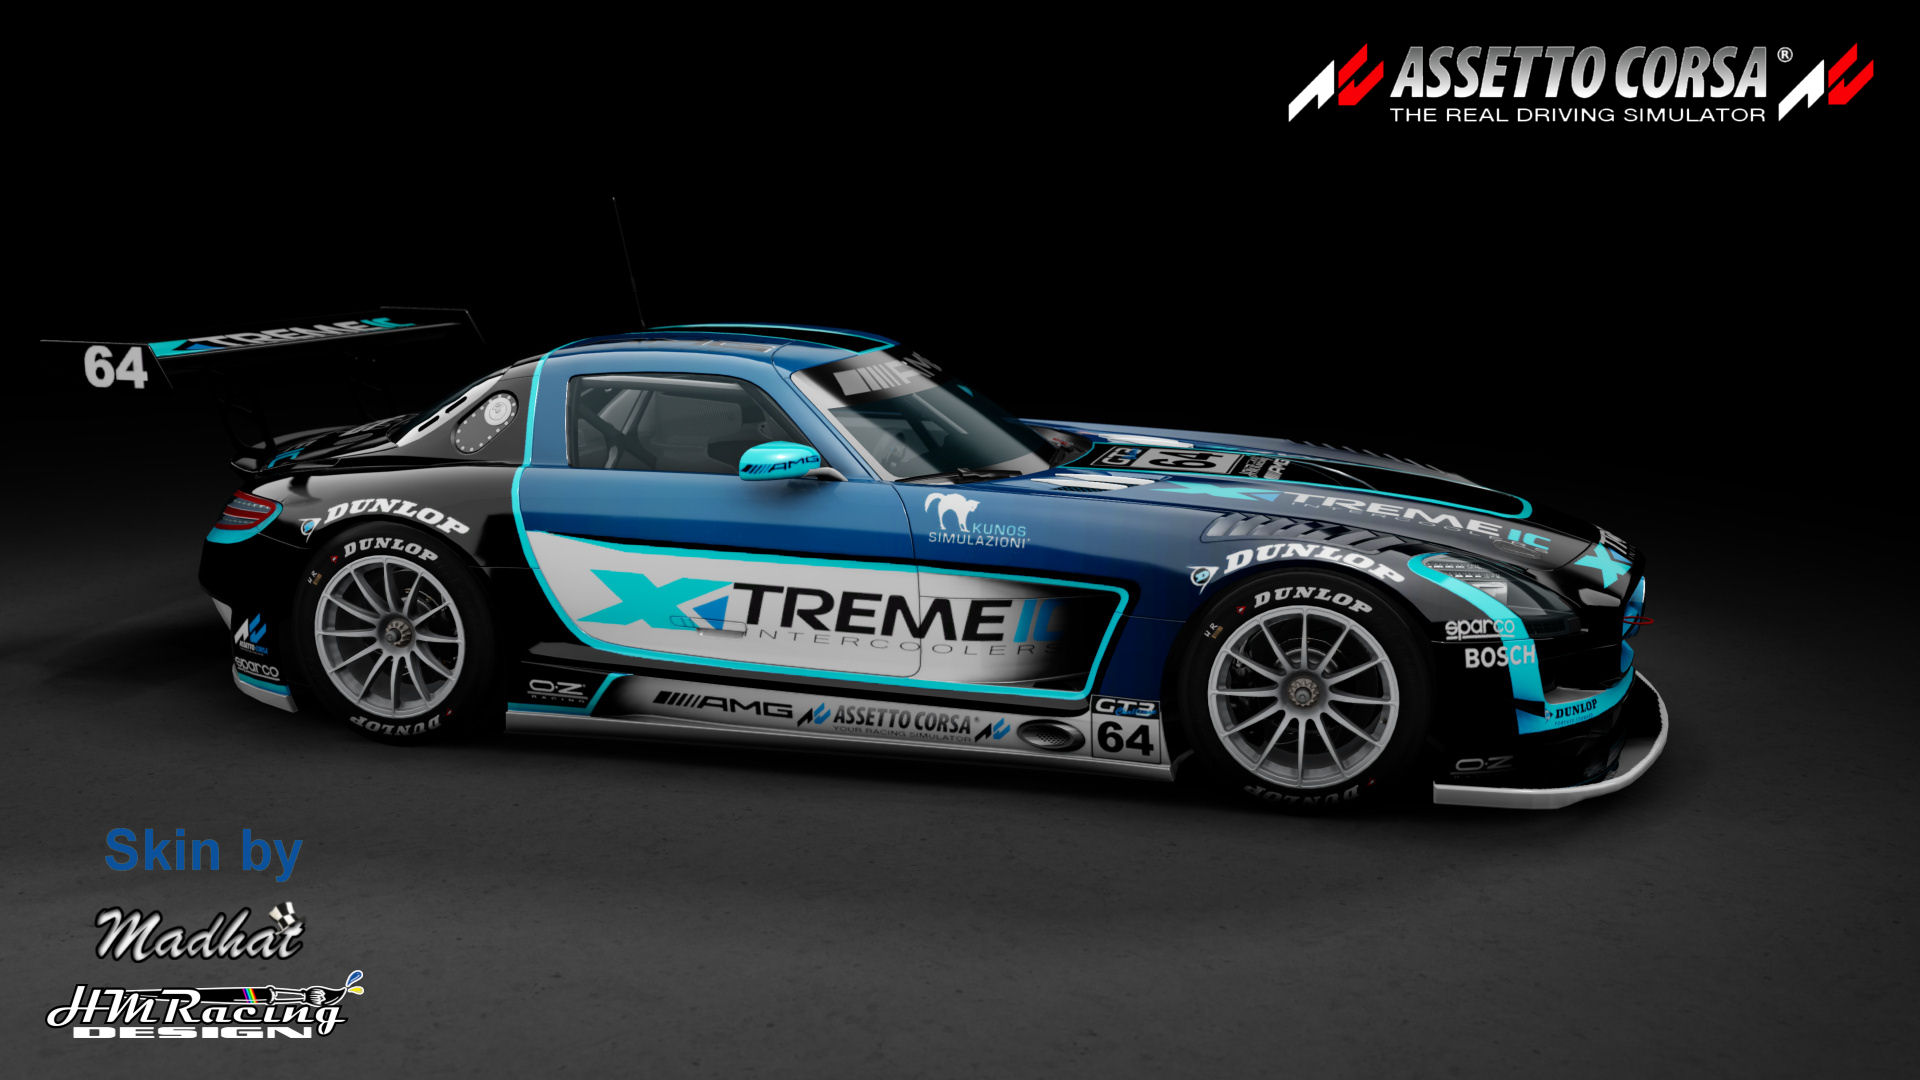 Mercedes SLS GT3 Xtremeic blue fade 03.jpg